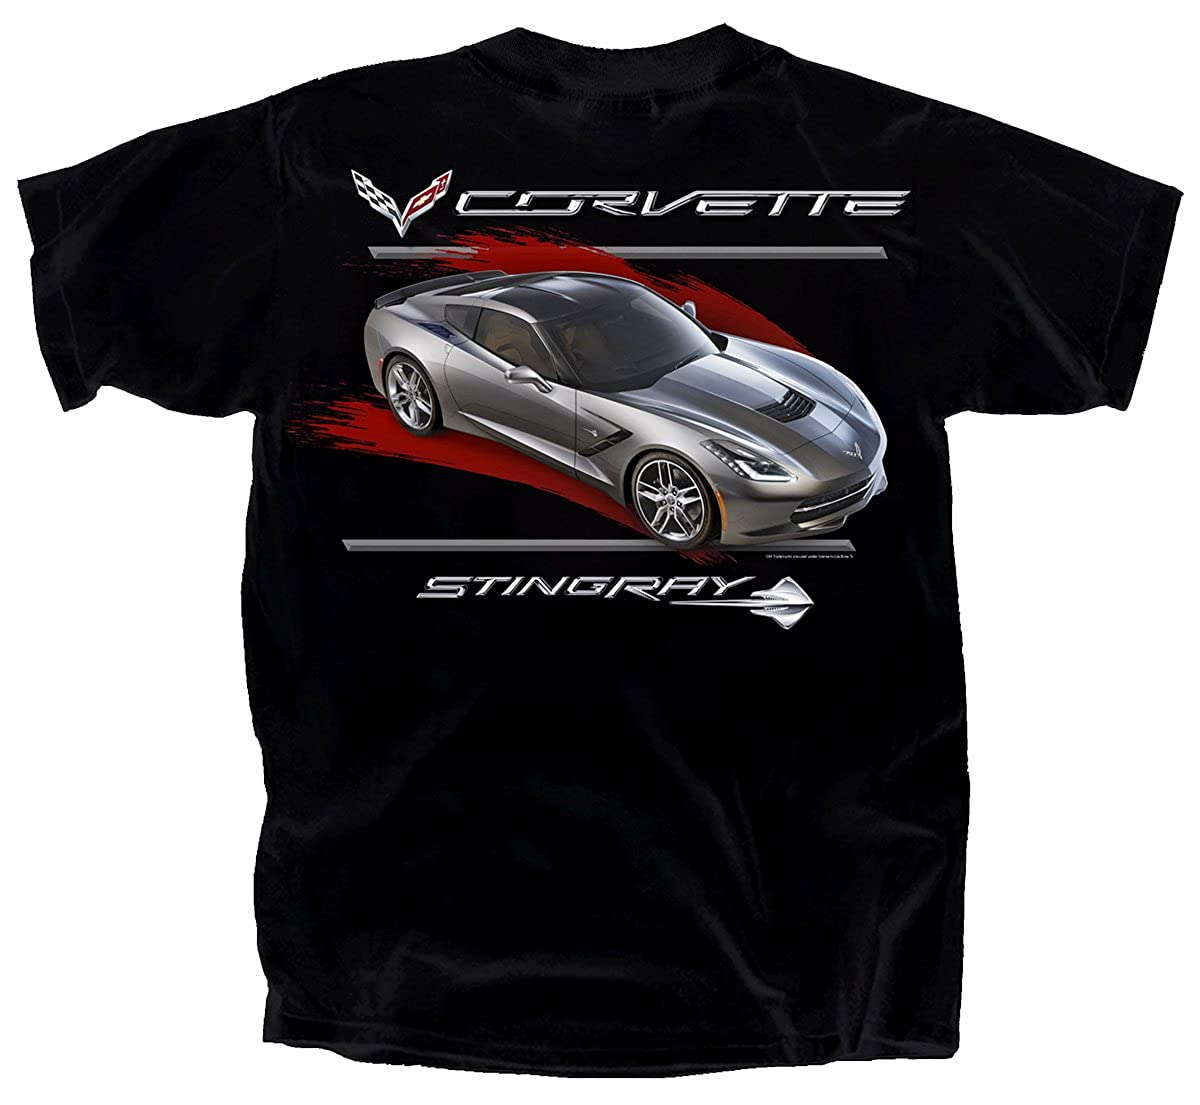 Joe Blow Grey C7 Corvette Stingray With Red Streak T-Shirt CVCGS